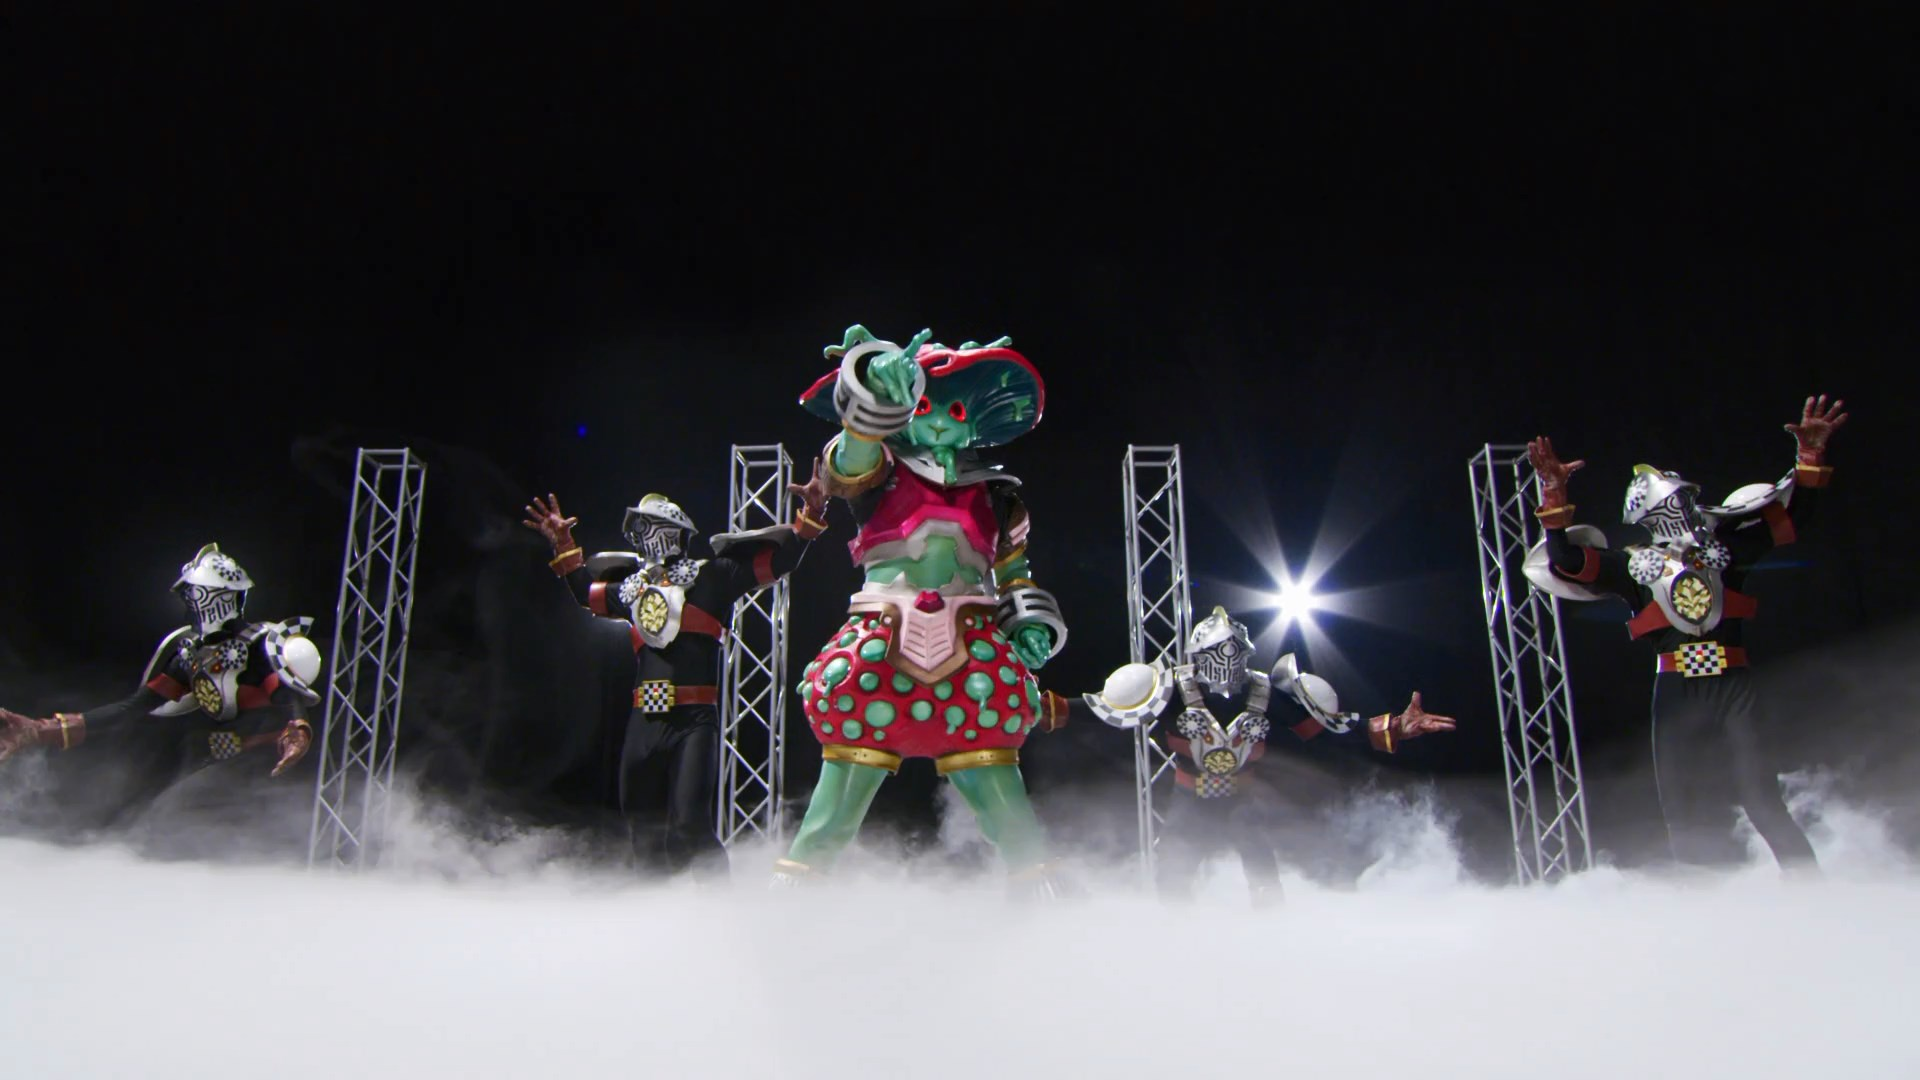 Kureon's music video